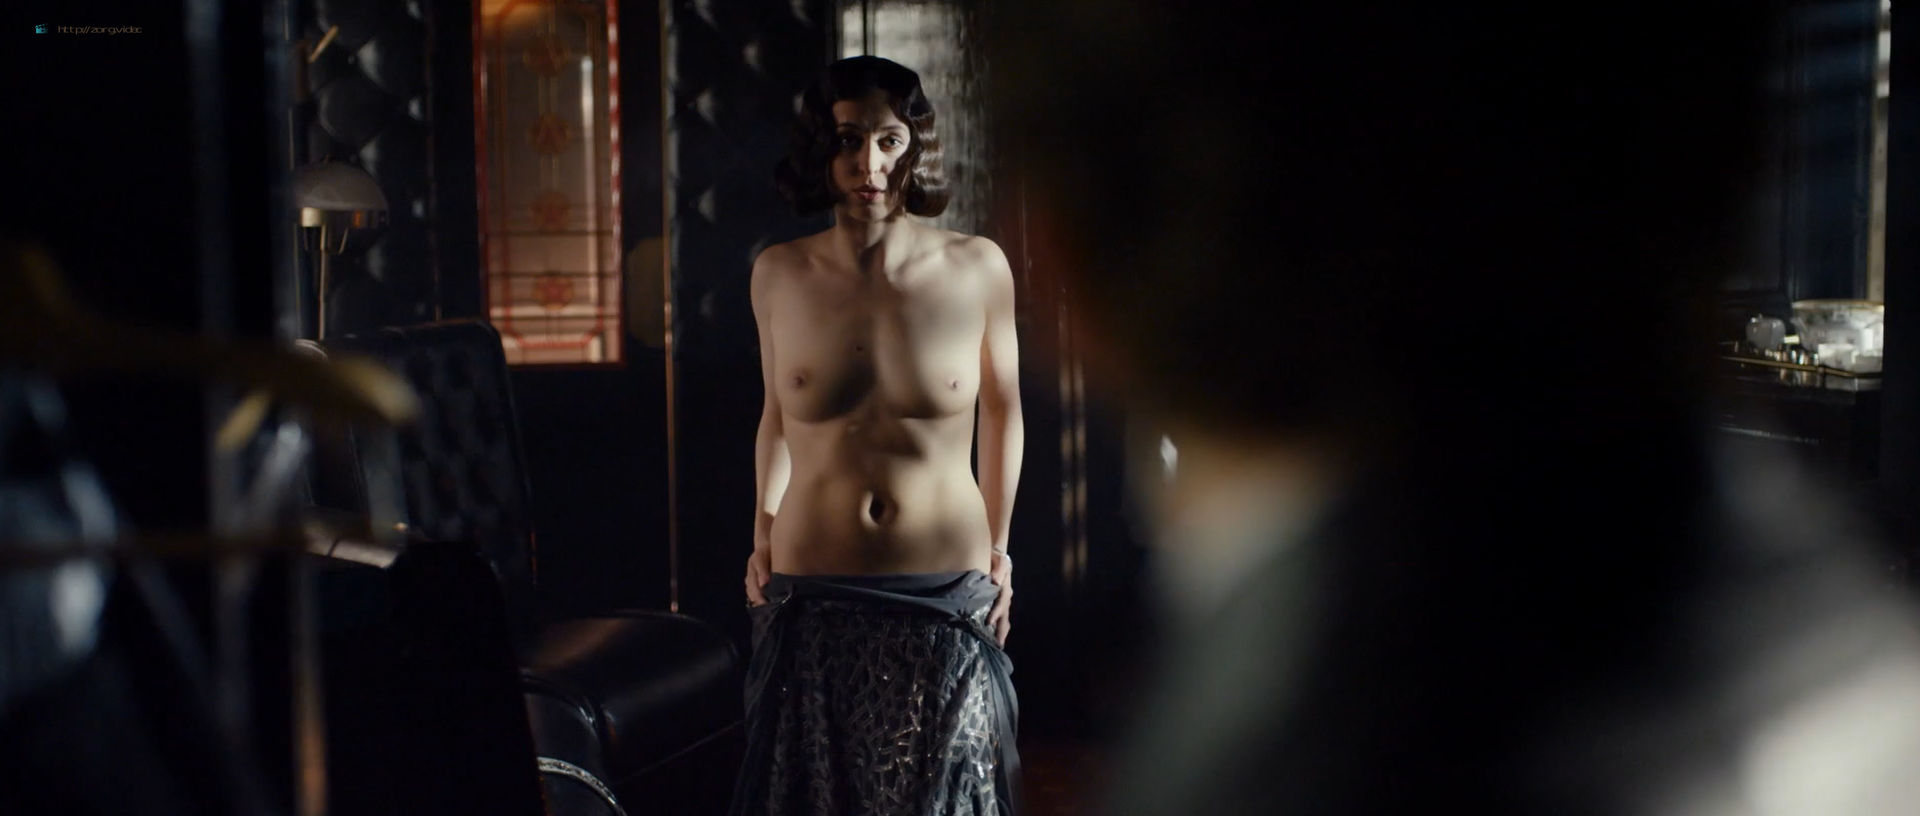 Anastasiya Meskova nude full frontal Olga Sutulova nude sex - Trotsky (2017) s1e1-2 HD 1080p (13)